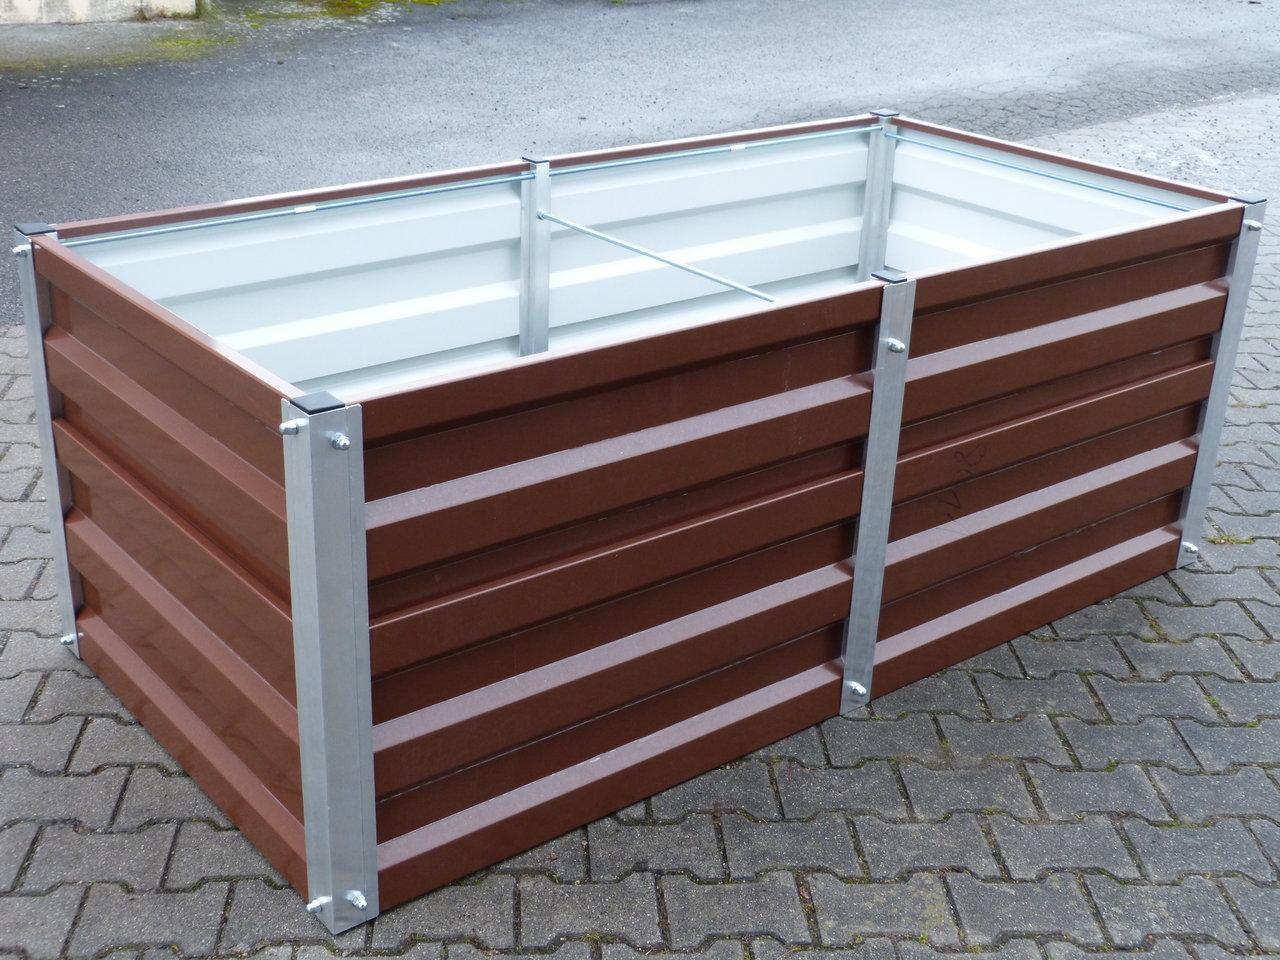 hochbeet metall gr 1 mtr breit x 2 5 mtr lang 75cm hoch. Black Bedroom Furniture Sets. Home Design Ideas